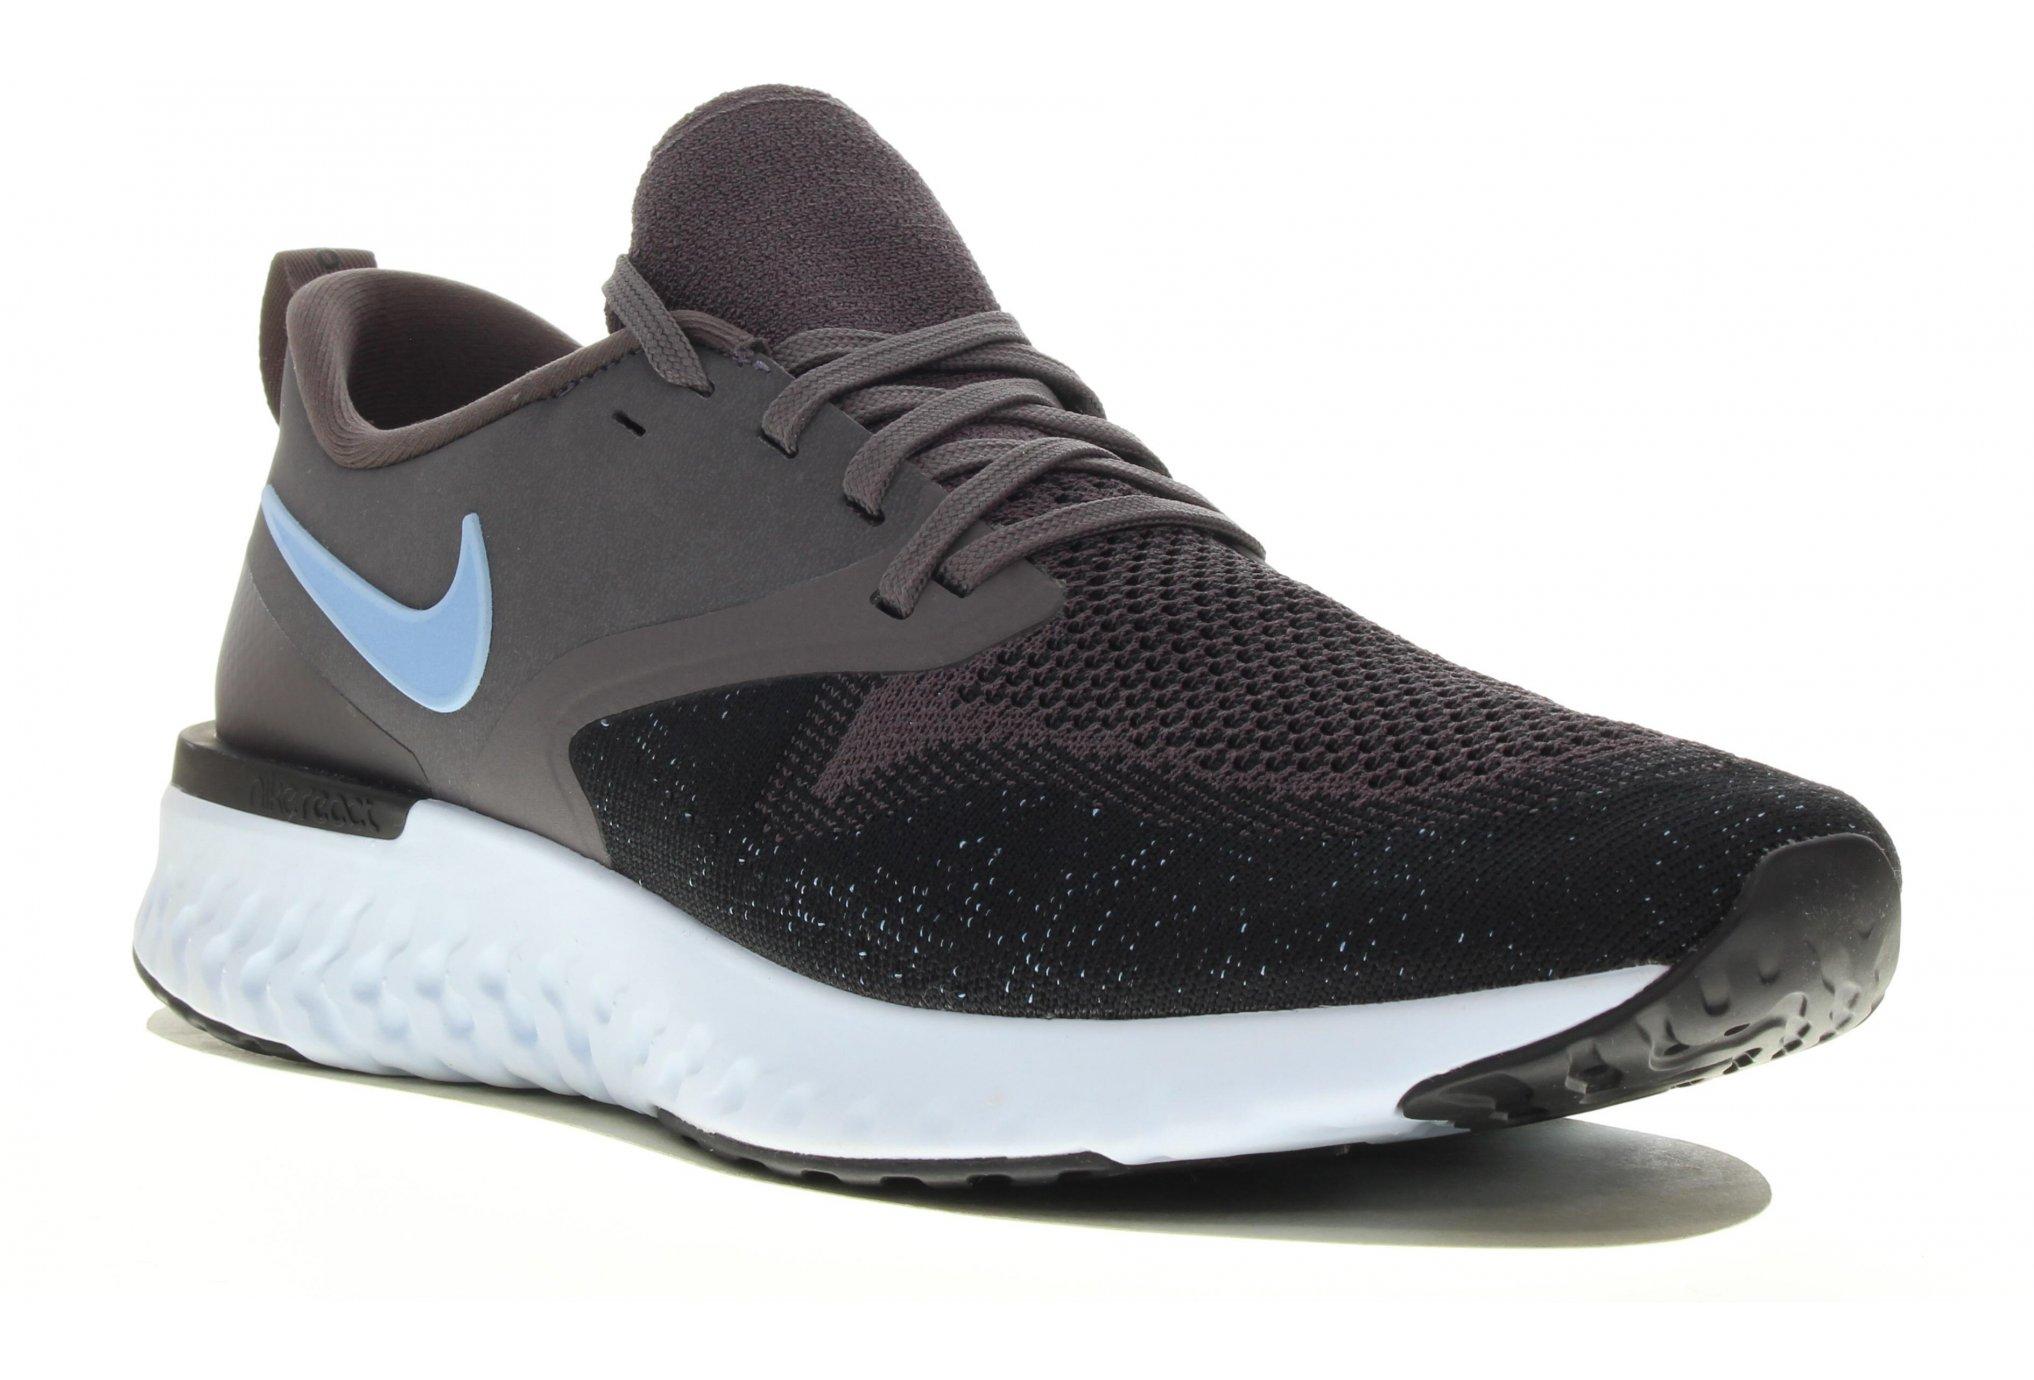 Nike Odyssey React Flyknit 2 M Diététique Chaussures homme